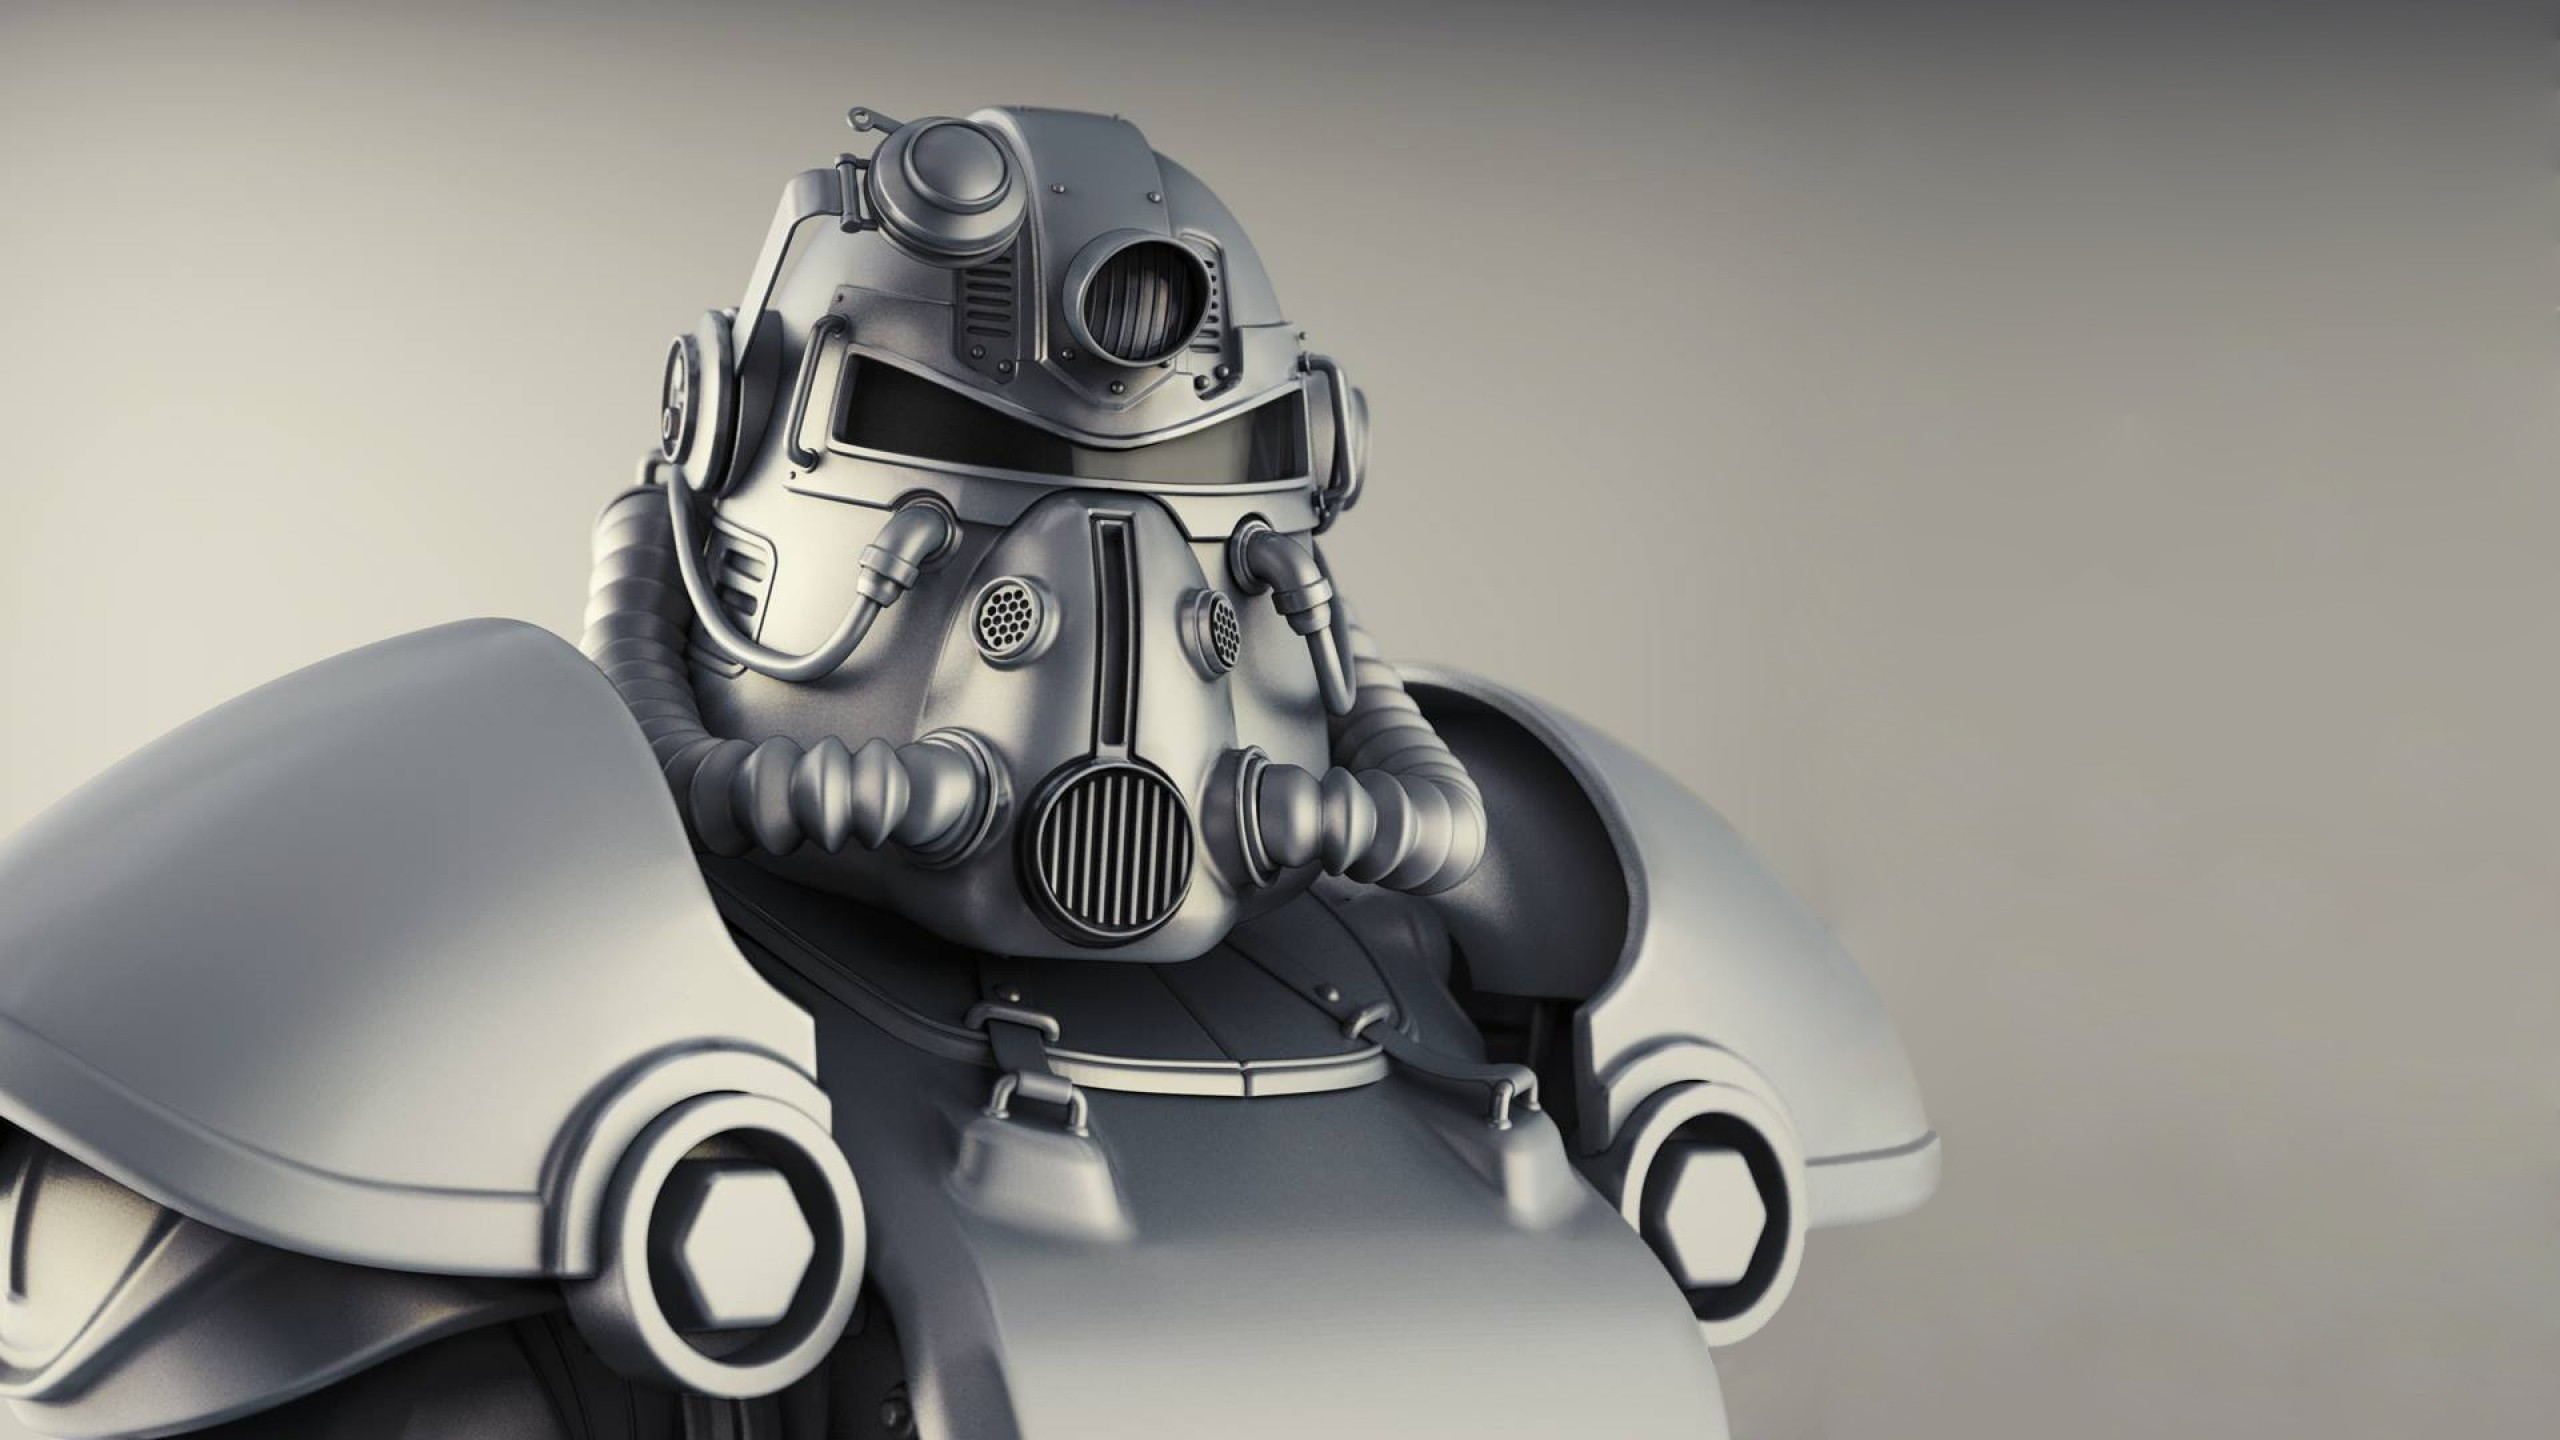 Wallpaper fallout 4, t-51b, power armor